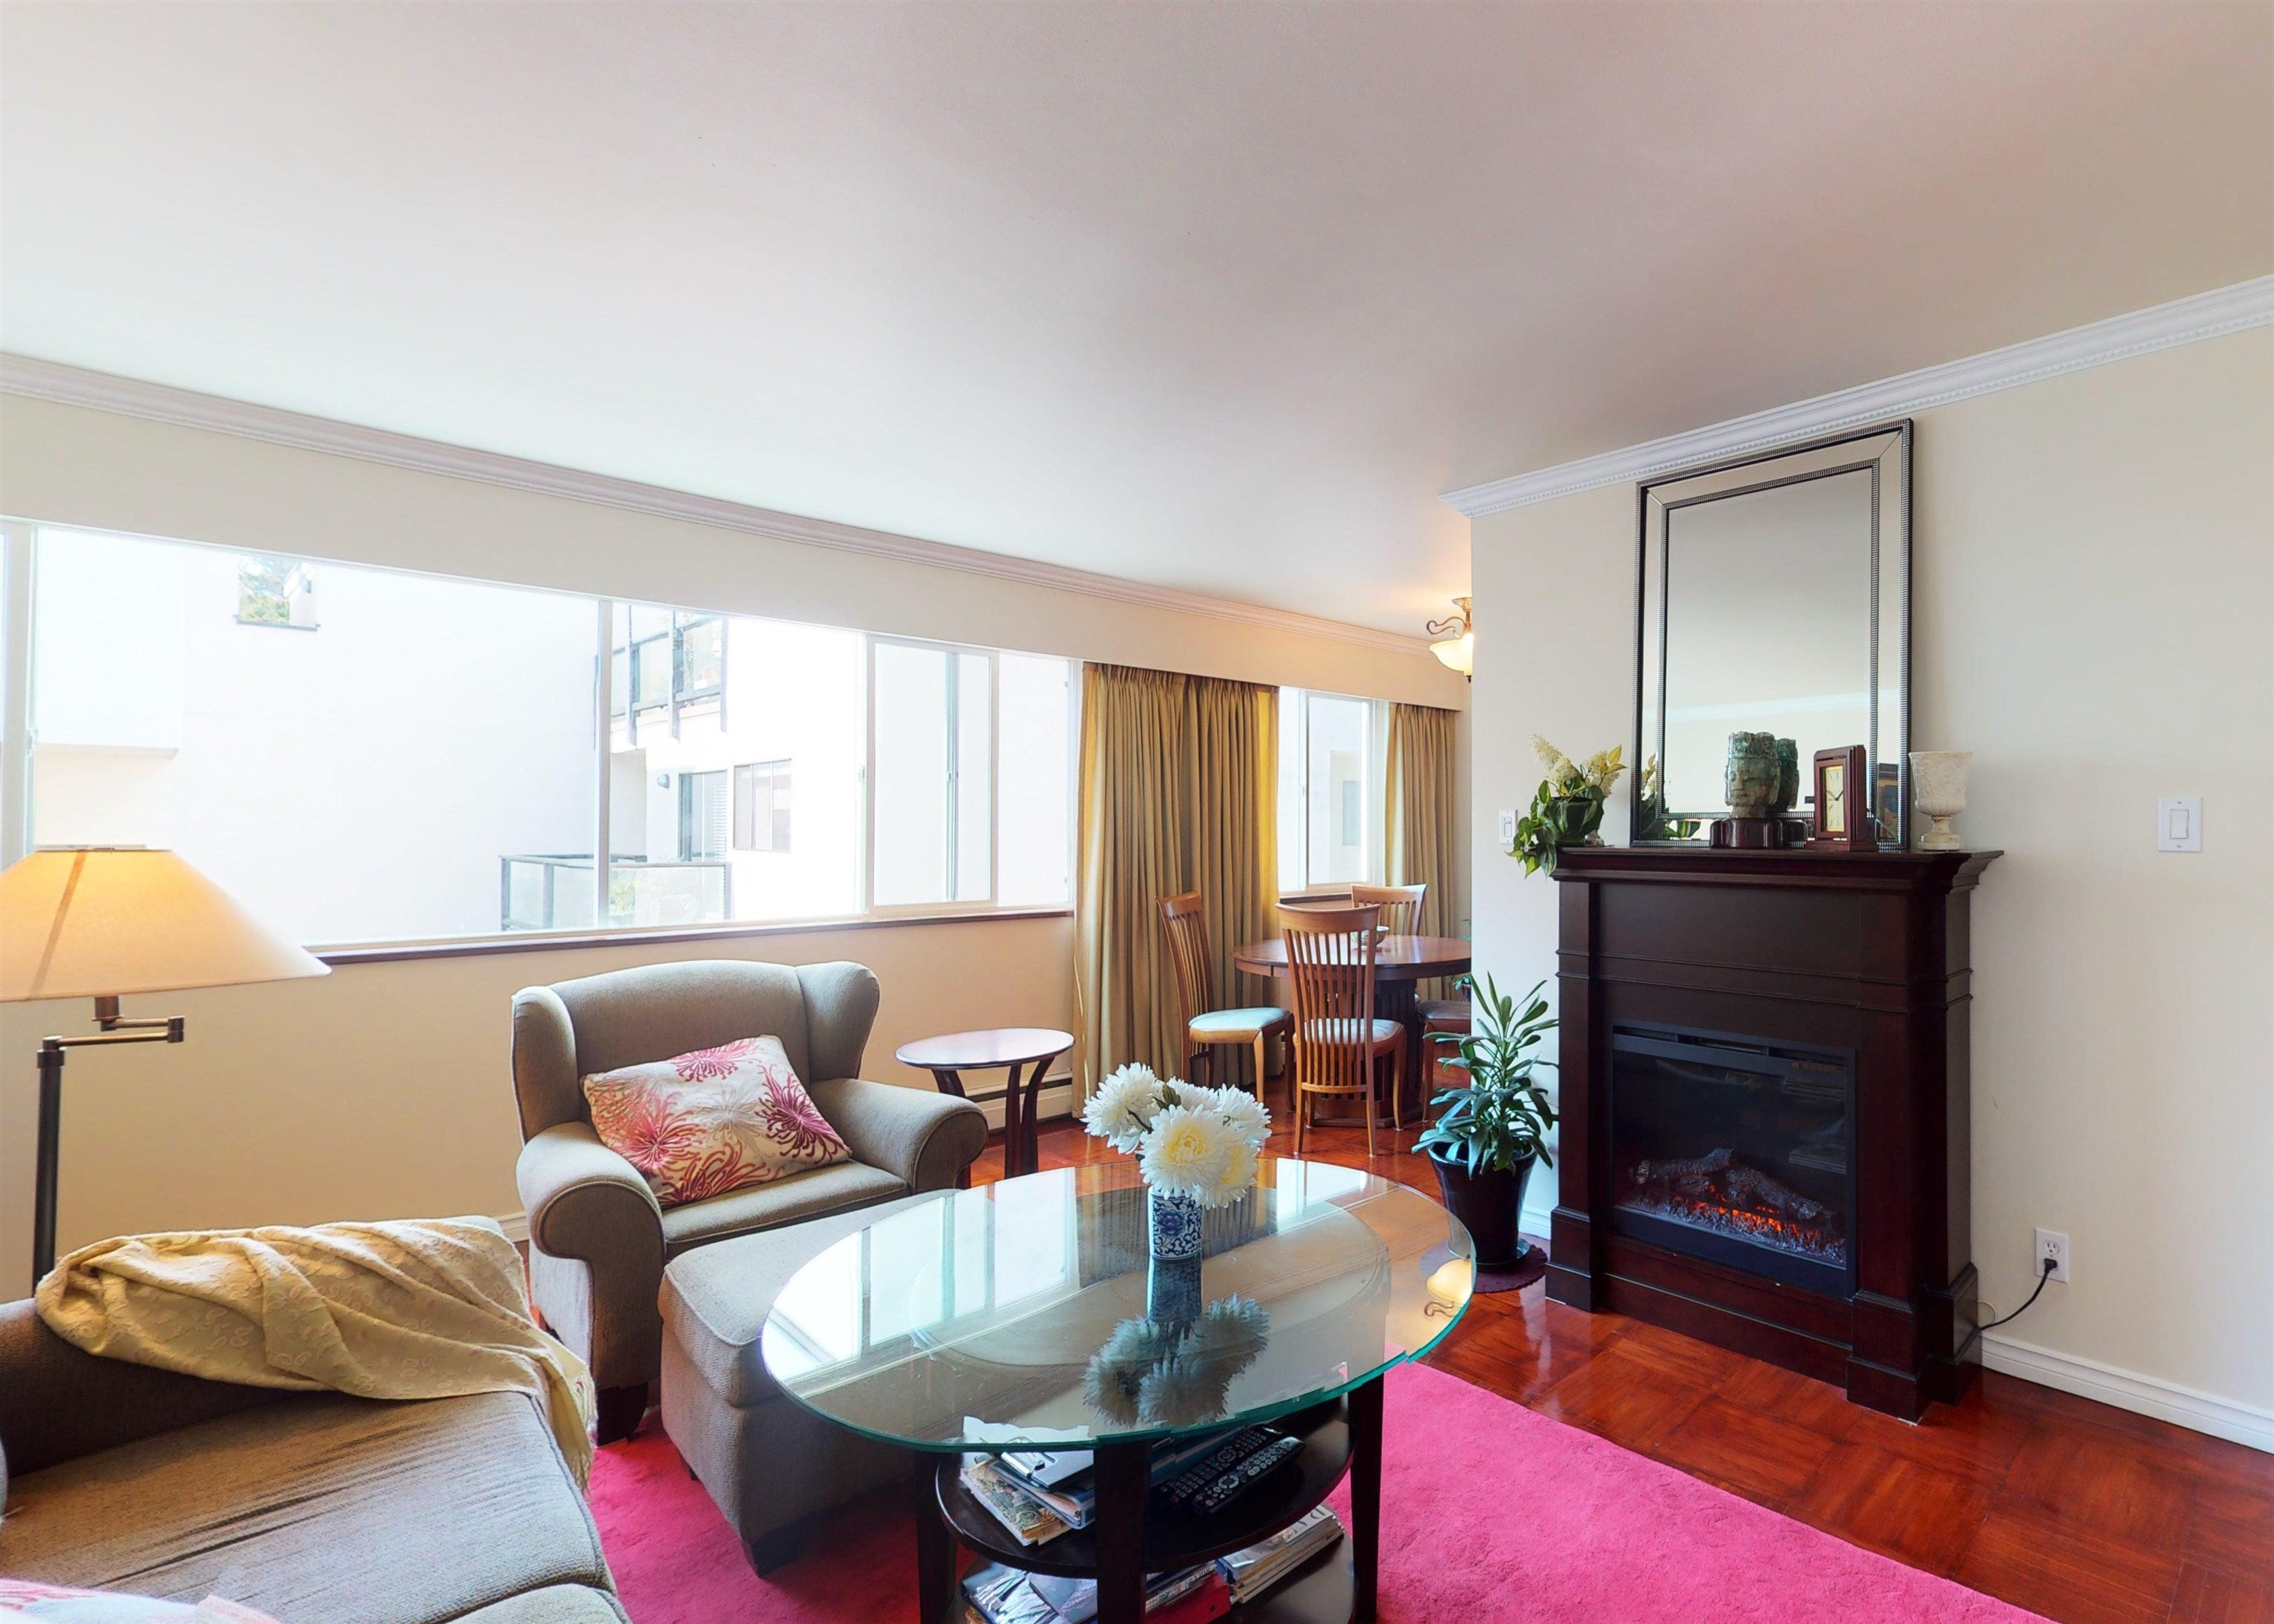 202 1750 ESQUIMALT AVENUE - Ambleside Apartment/Condo for sale, 1 Bedroom (R2610188) - #8